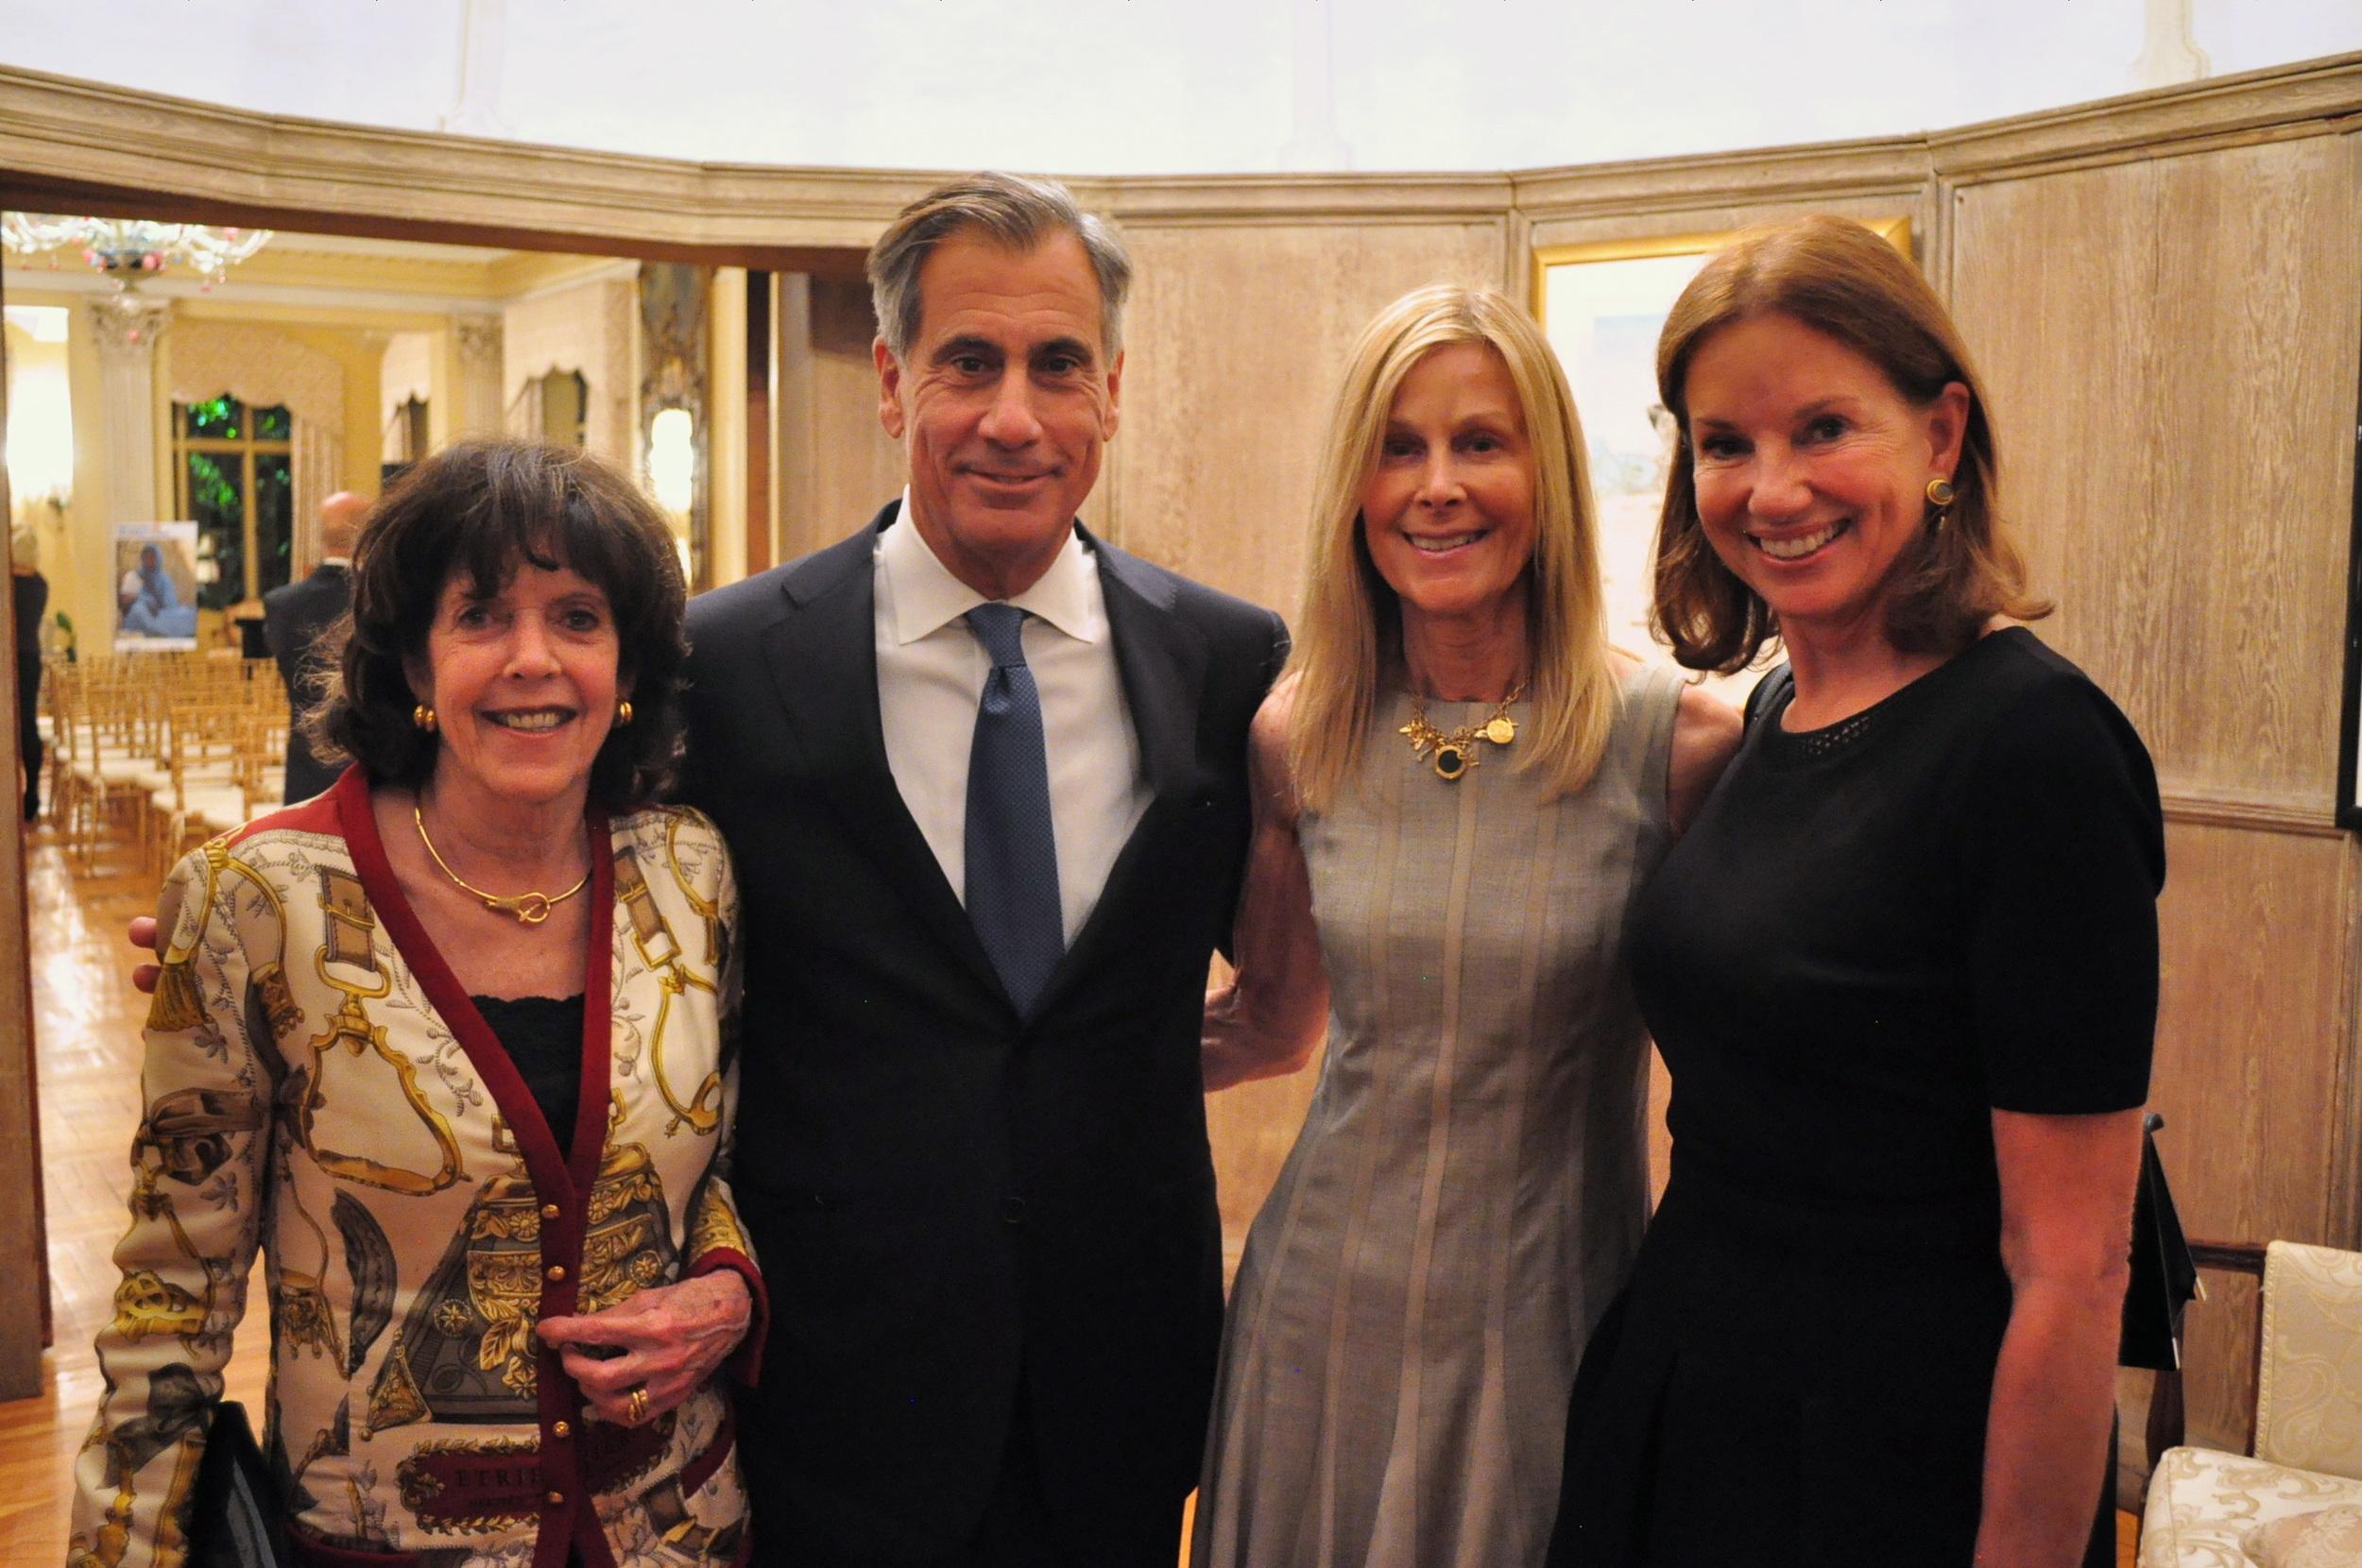 Didi Cutler, George Valanos, RI Chair Eileen Shields-West, and Frederica Valanos.